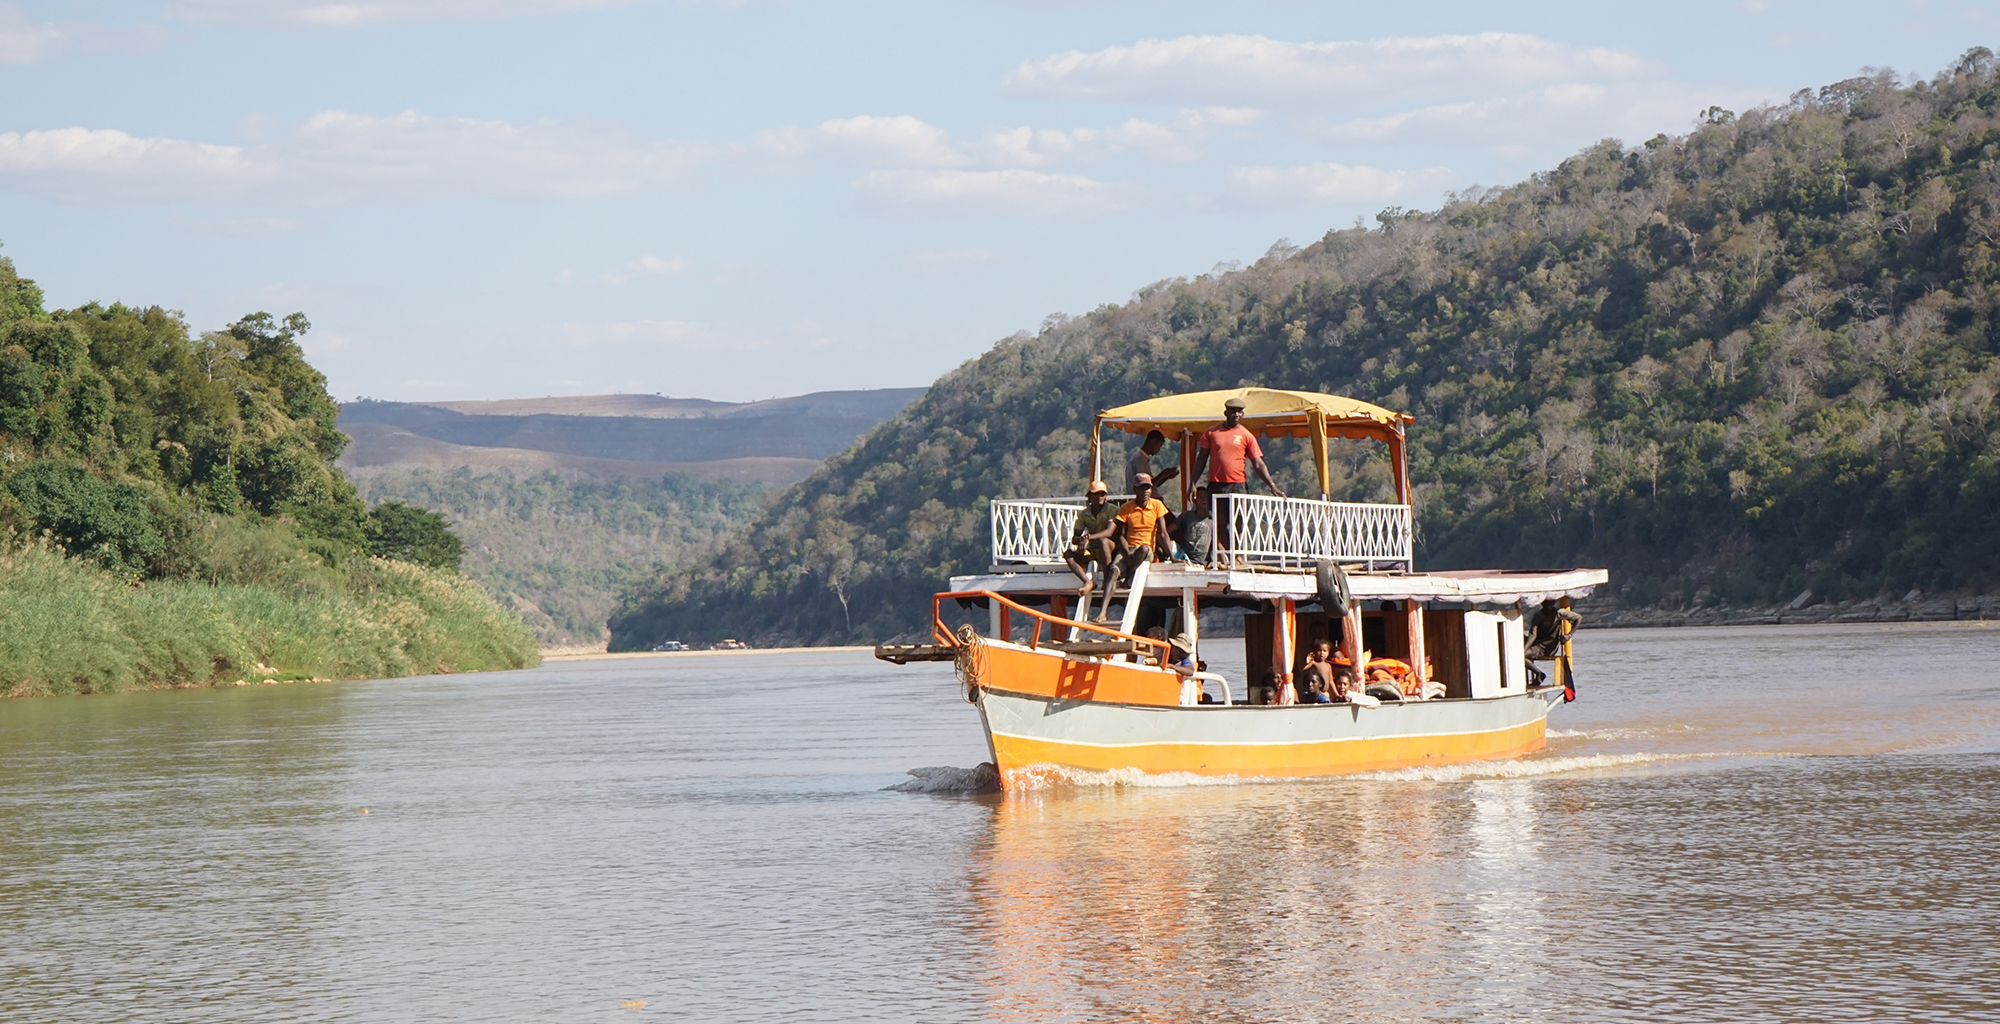 Madagascar-Tsirbihina-River-Journeys-Boat-in-River